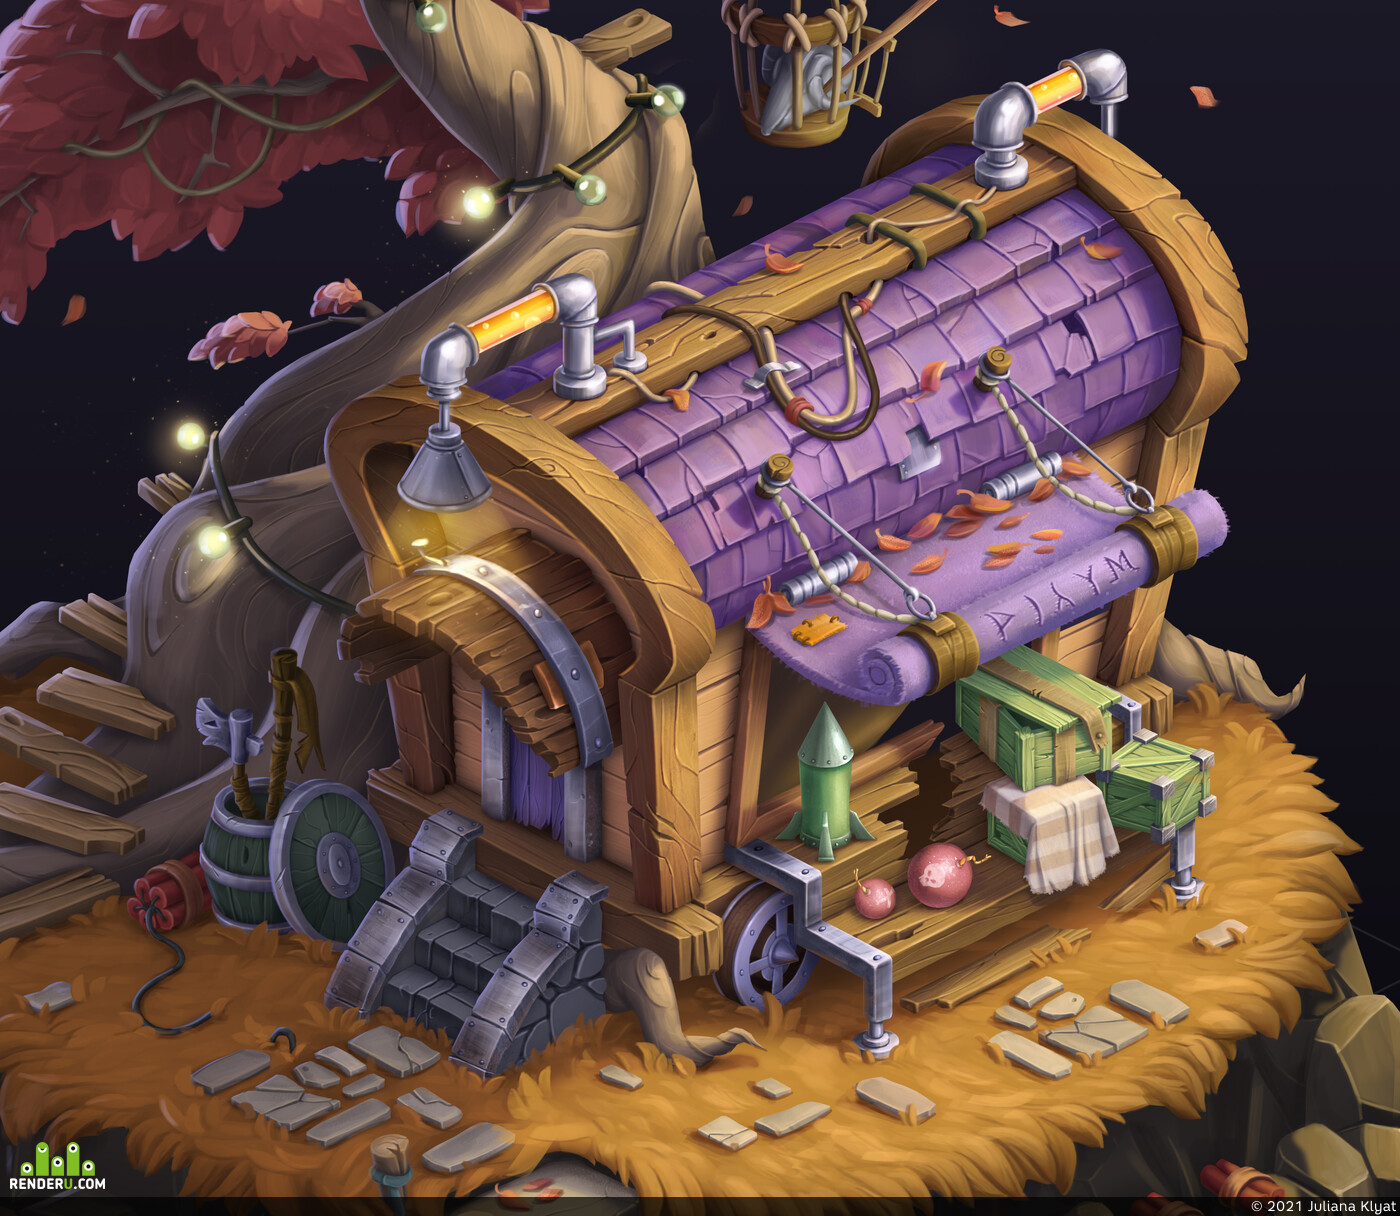 goblins, wagon, isometric, War, dynamite, box, cell, Fantasy, bomb